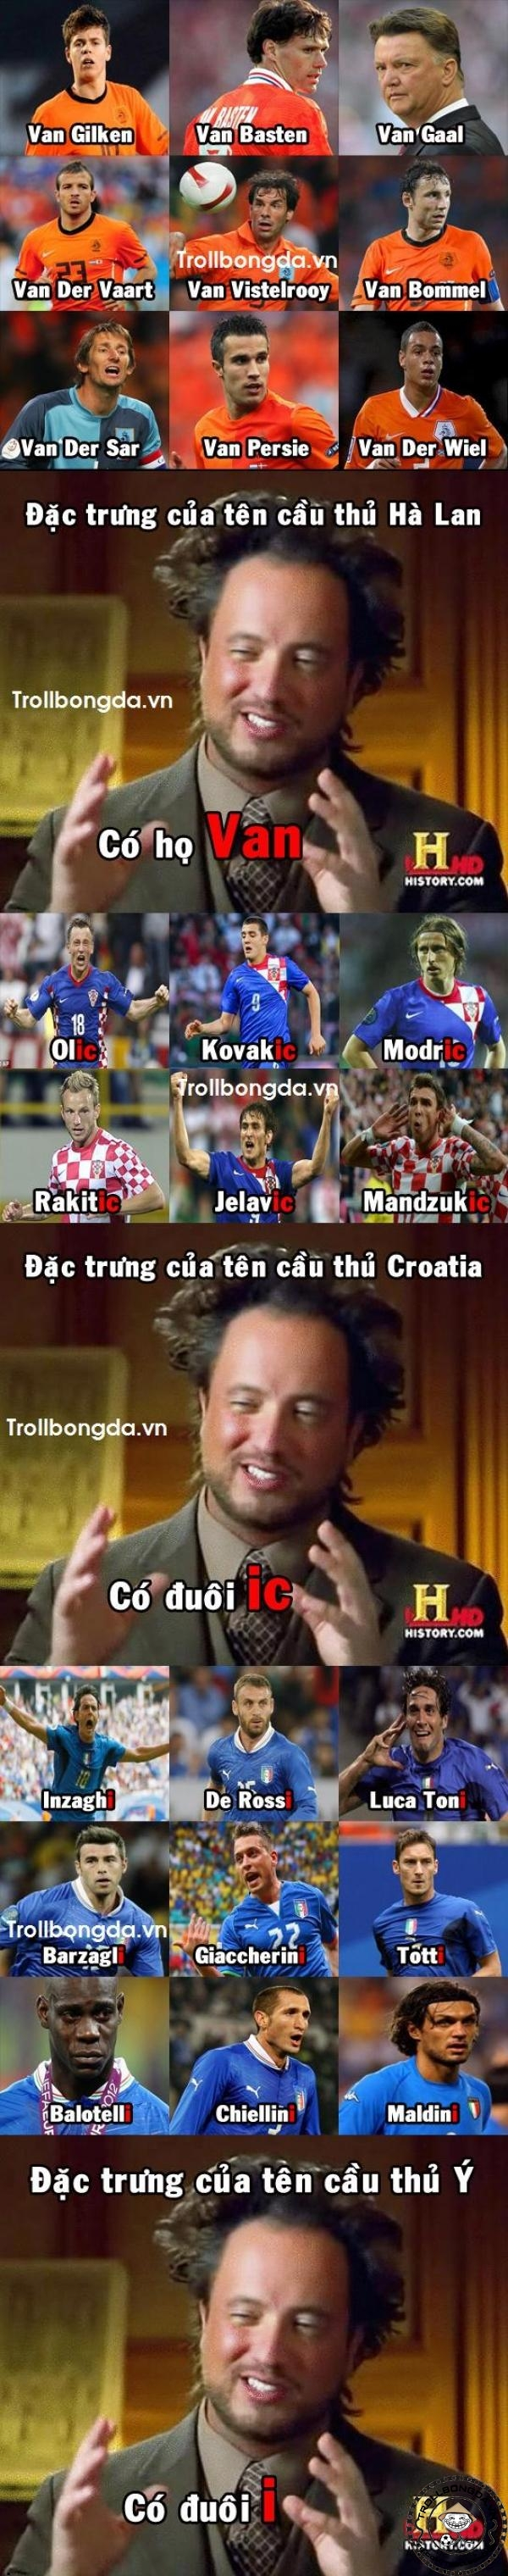 Hà Lan = Van. Croatia = ic. Italia = i